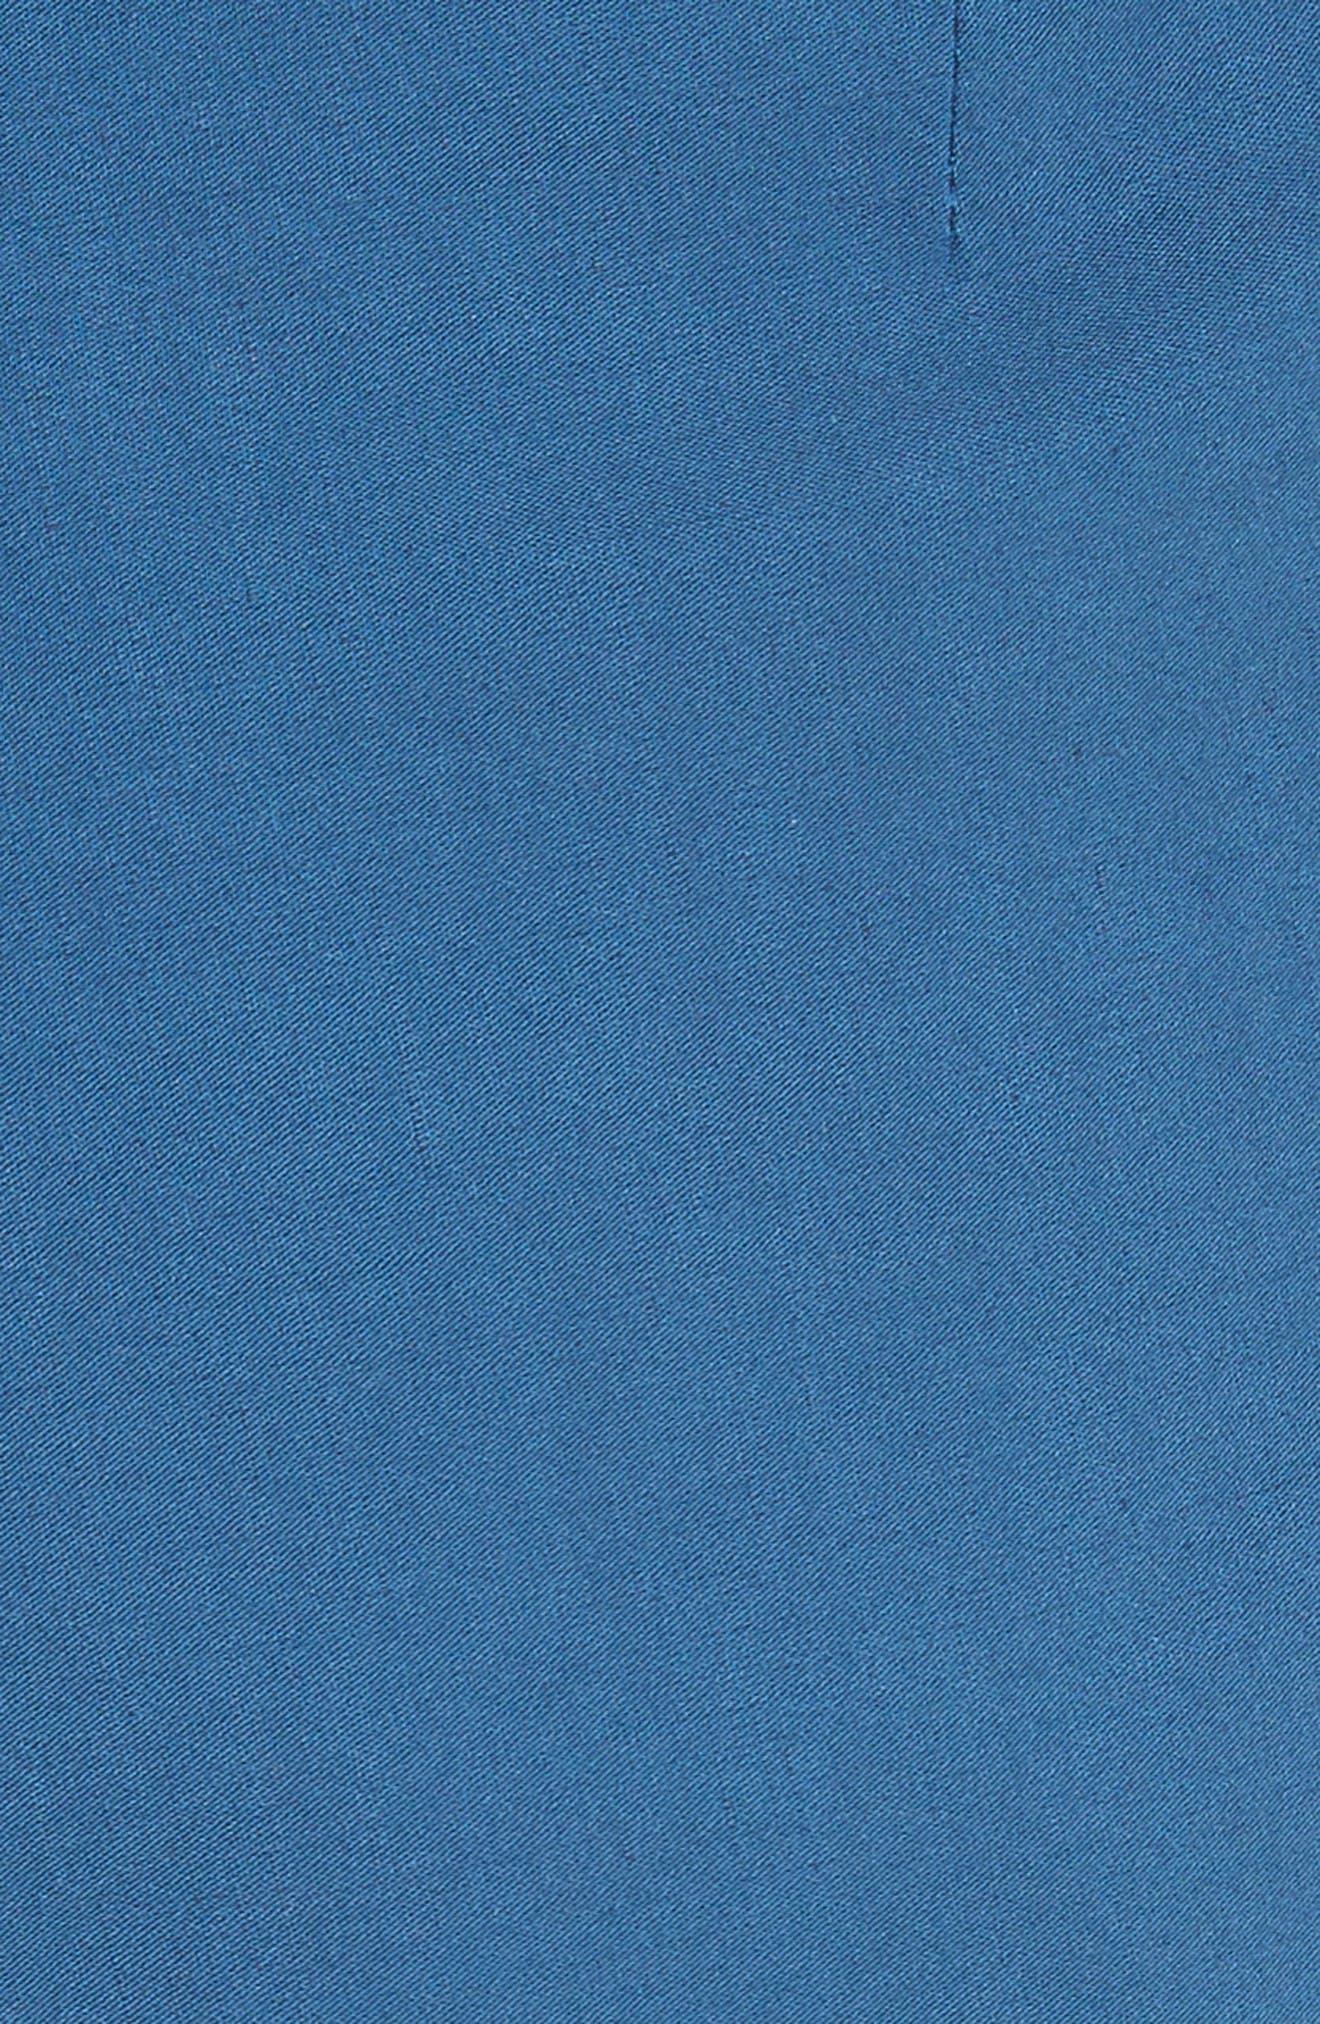 Poppy Belted Cotton & Linen Blend Shorts,                             Alternate thumbnail 5, color,                             Blue